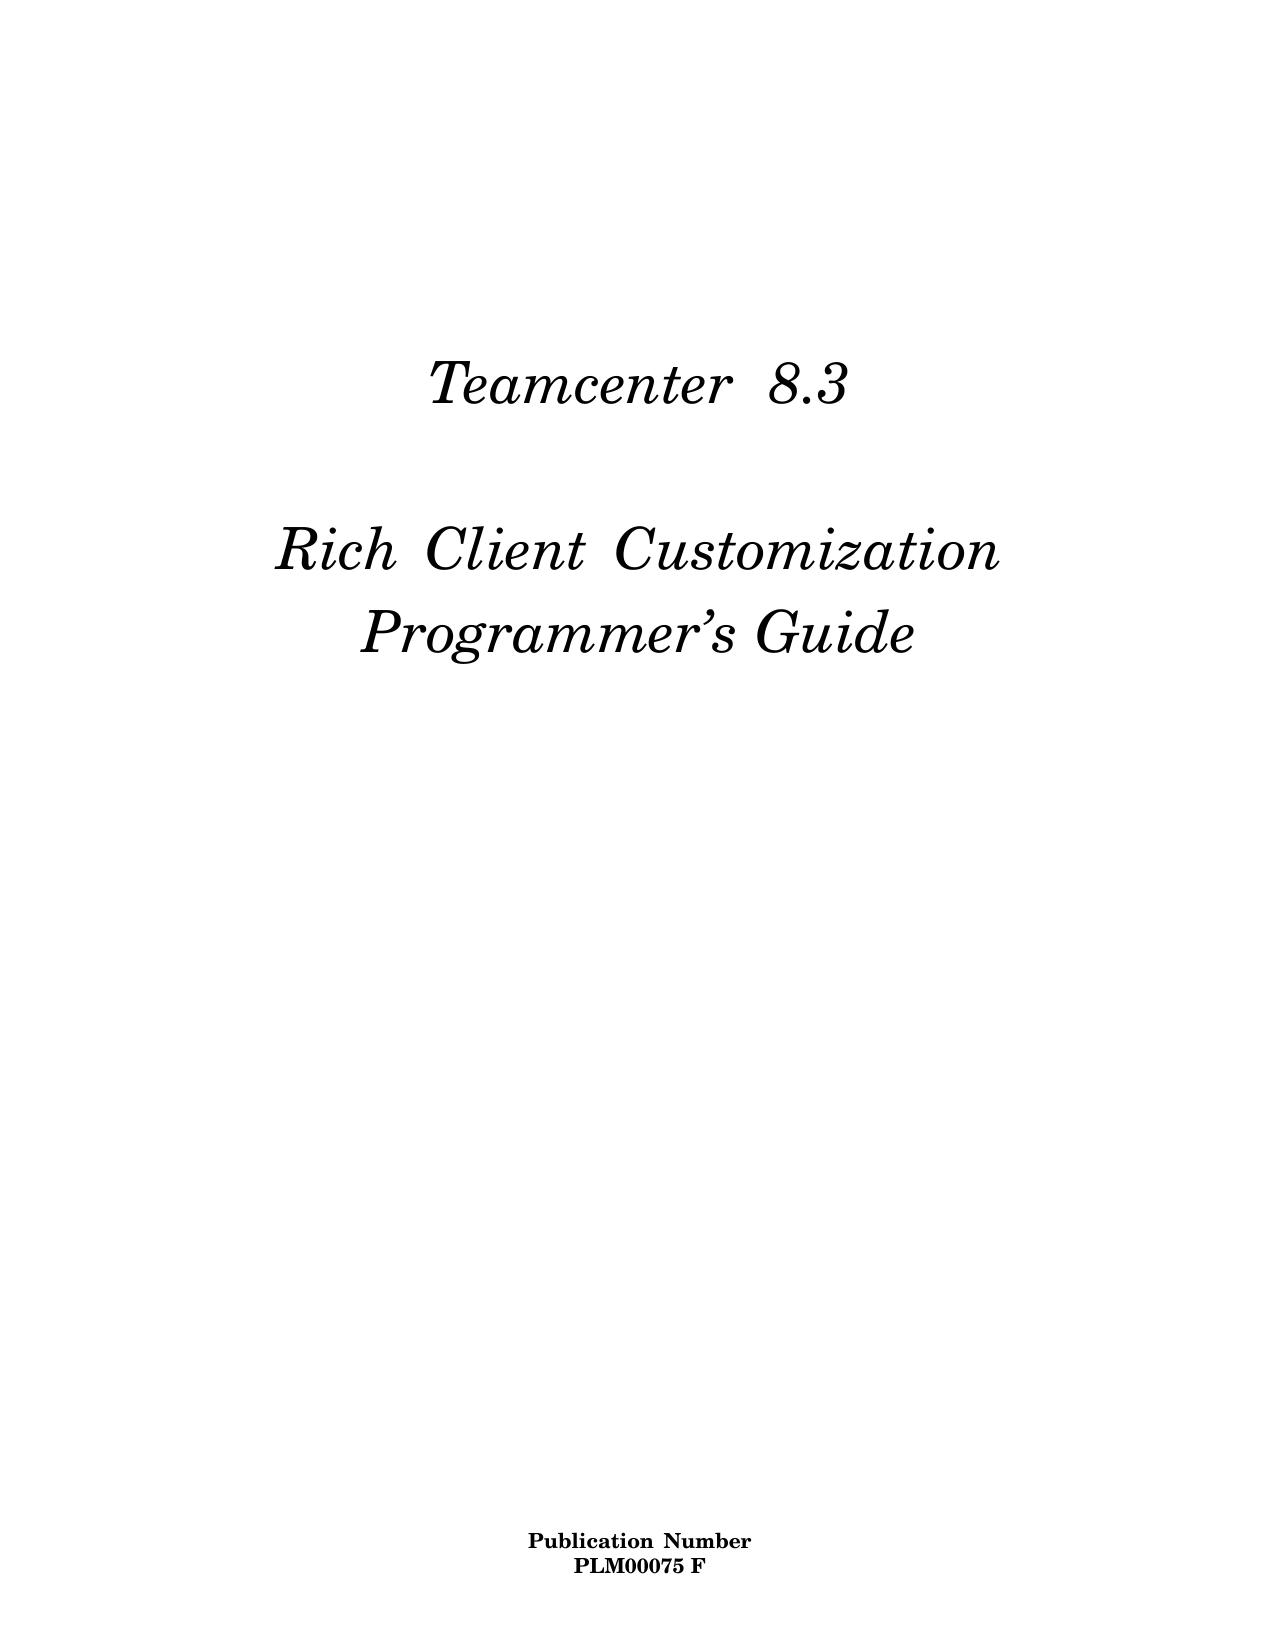 Rich Client Customization Programmer`s Guide | manualzz com